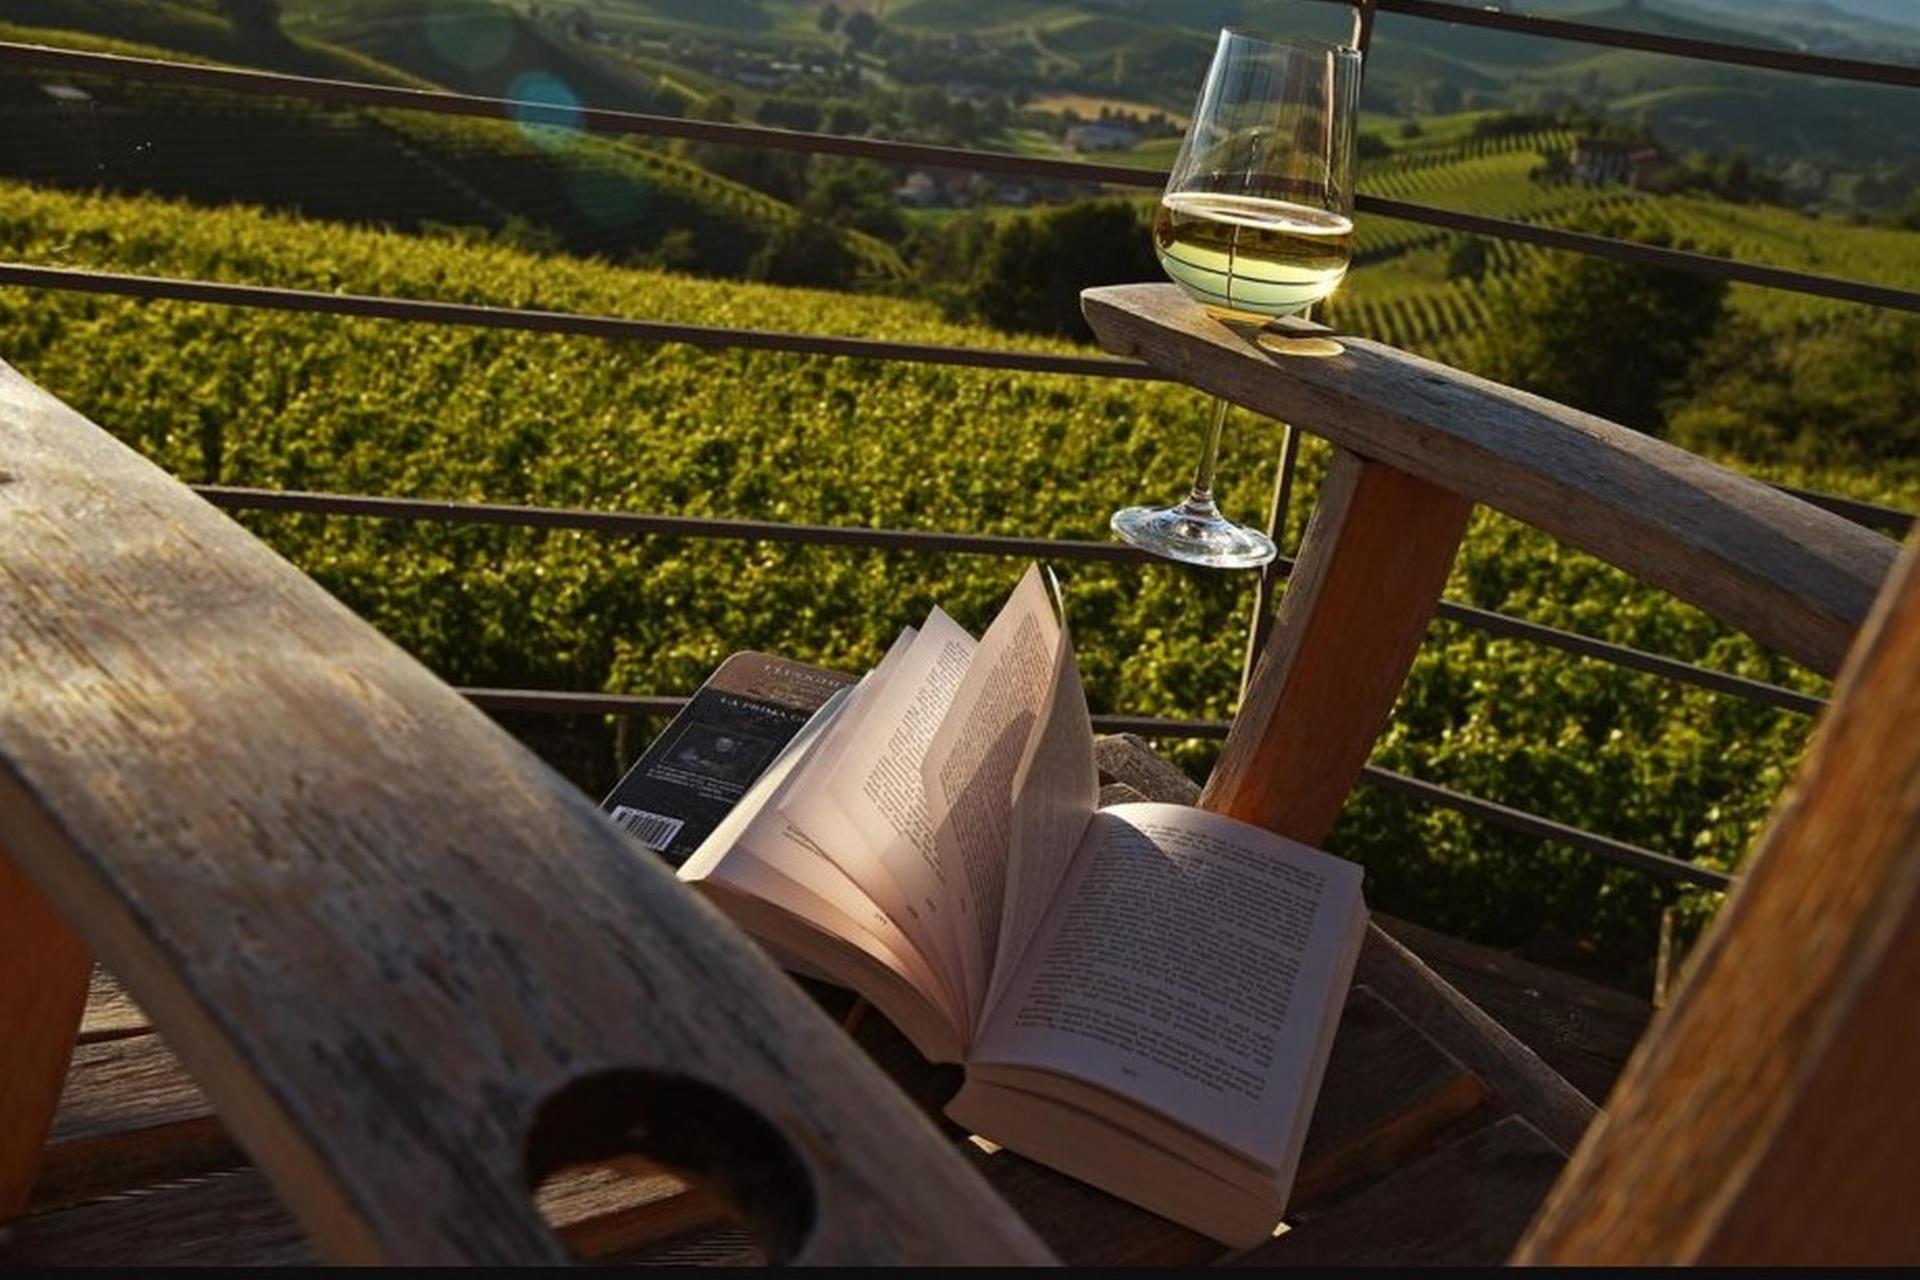 Agriturismo Piedmont Agriturismo in an authentic village in Piedmont